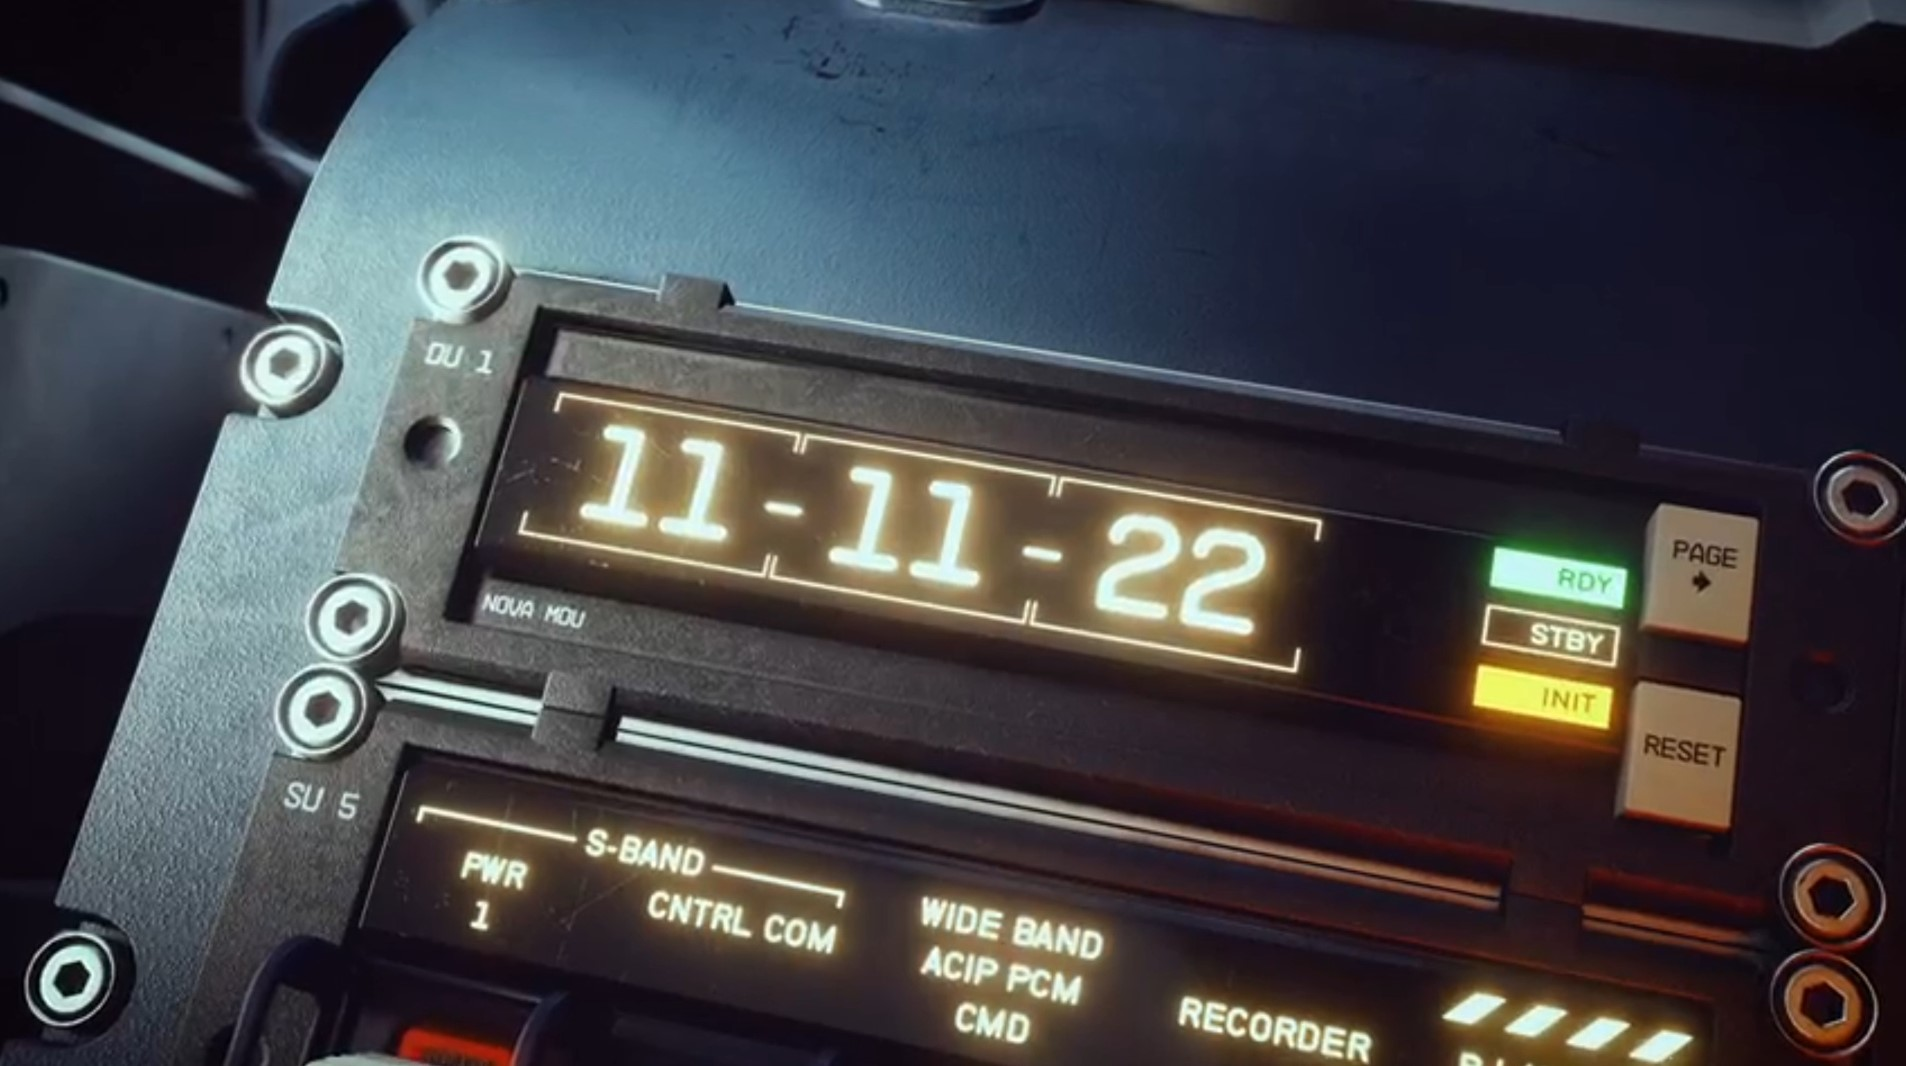 Starfield is launching November 11, 2022, according to leaked trailer    VentureBeat